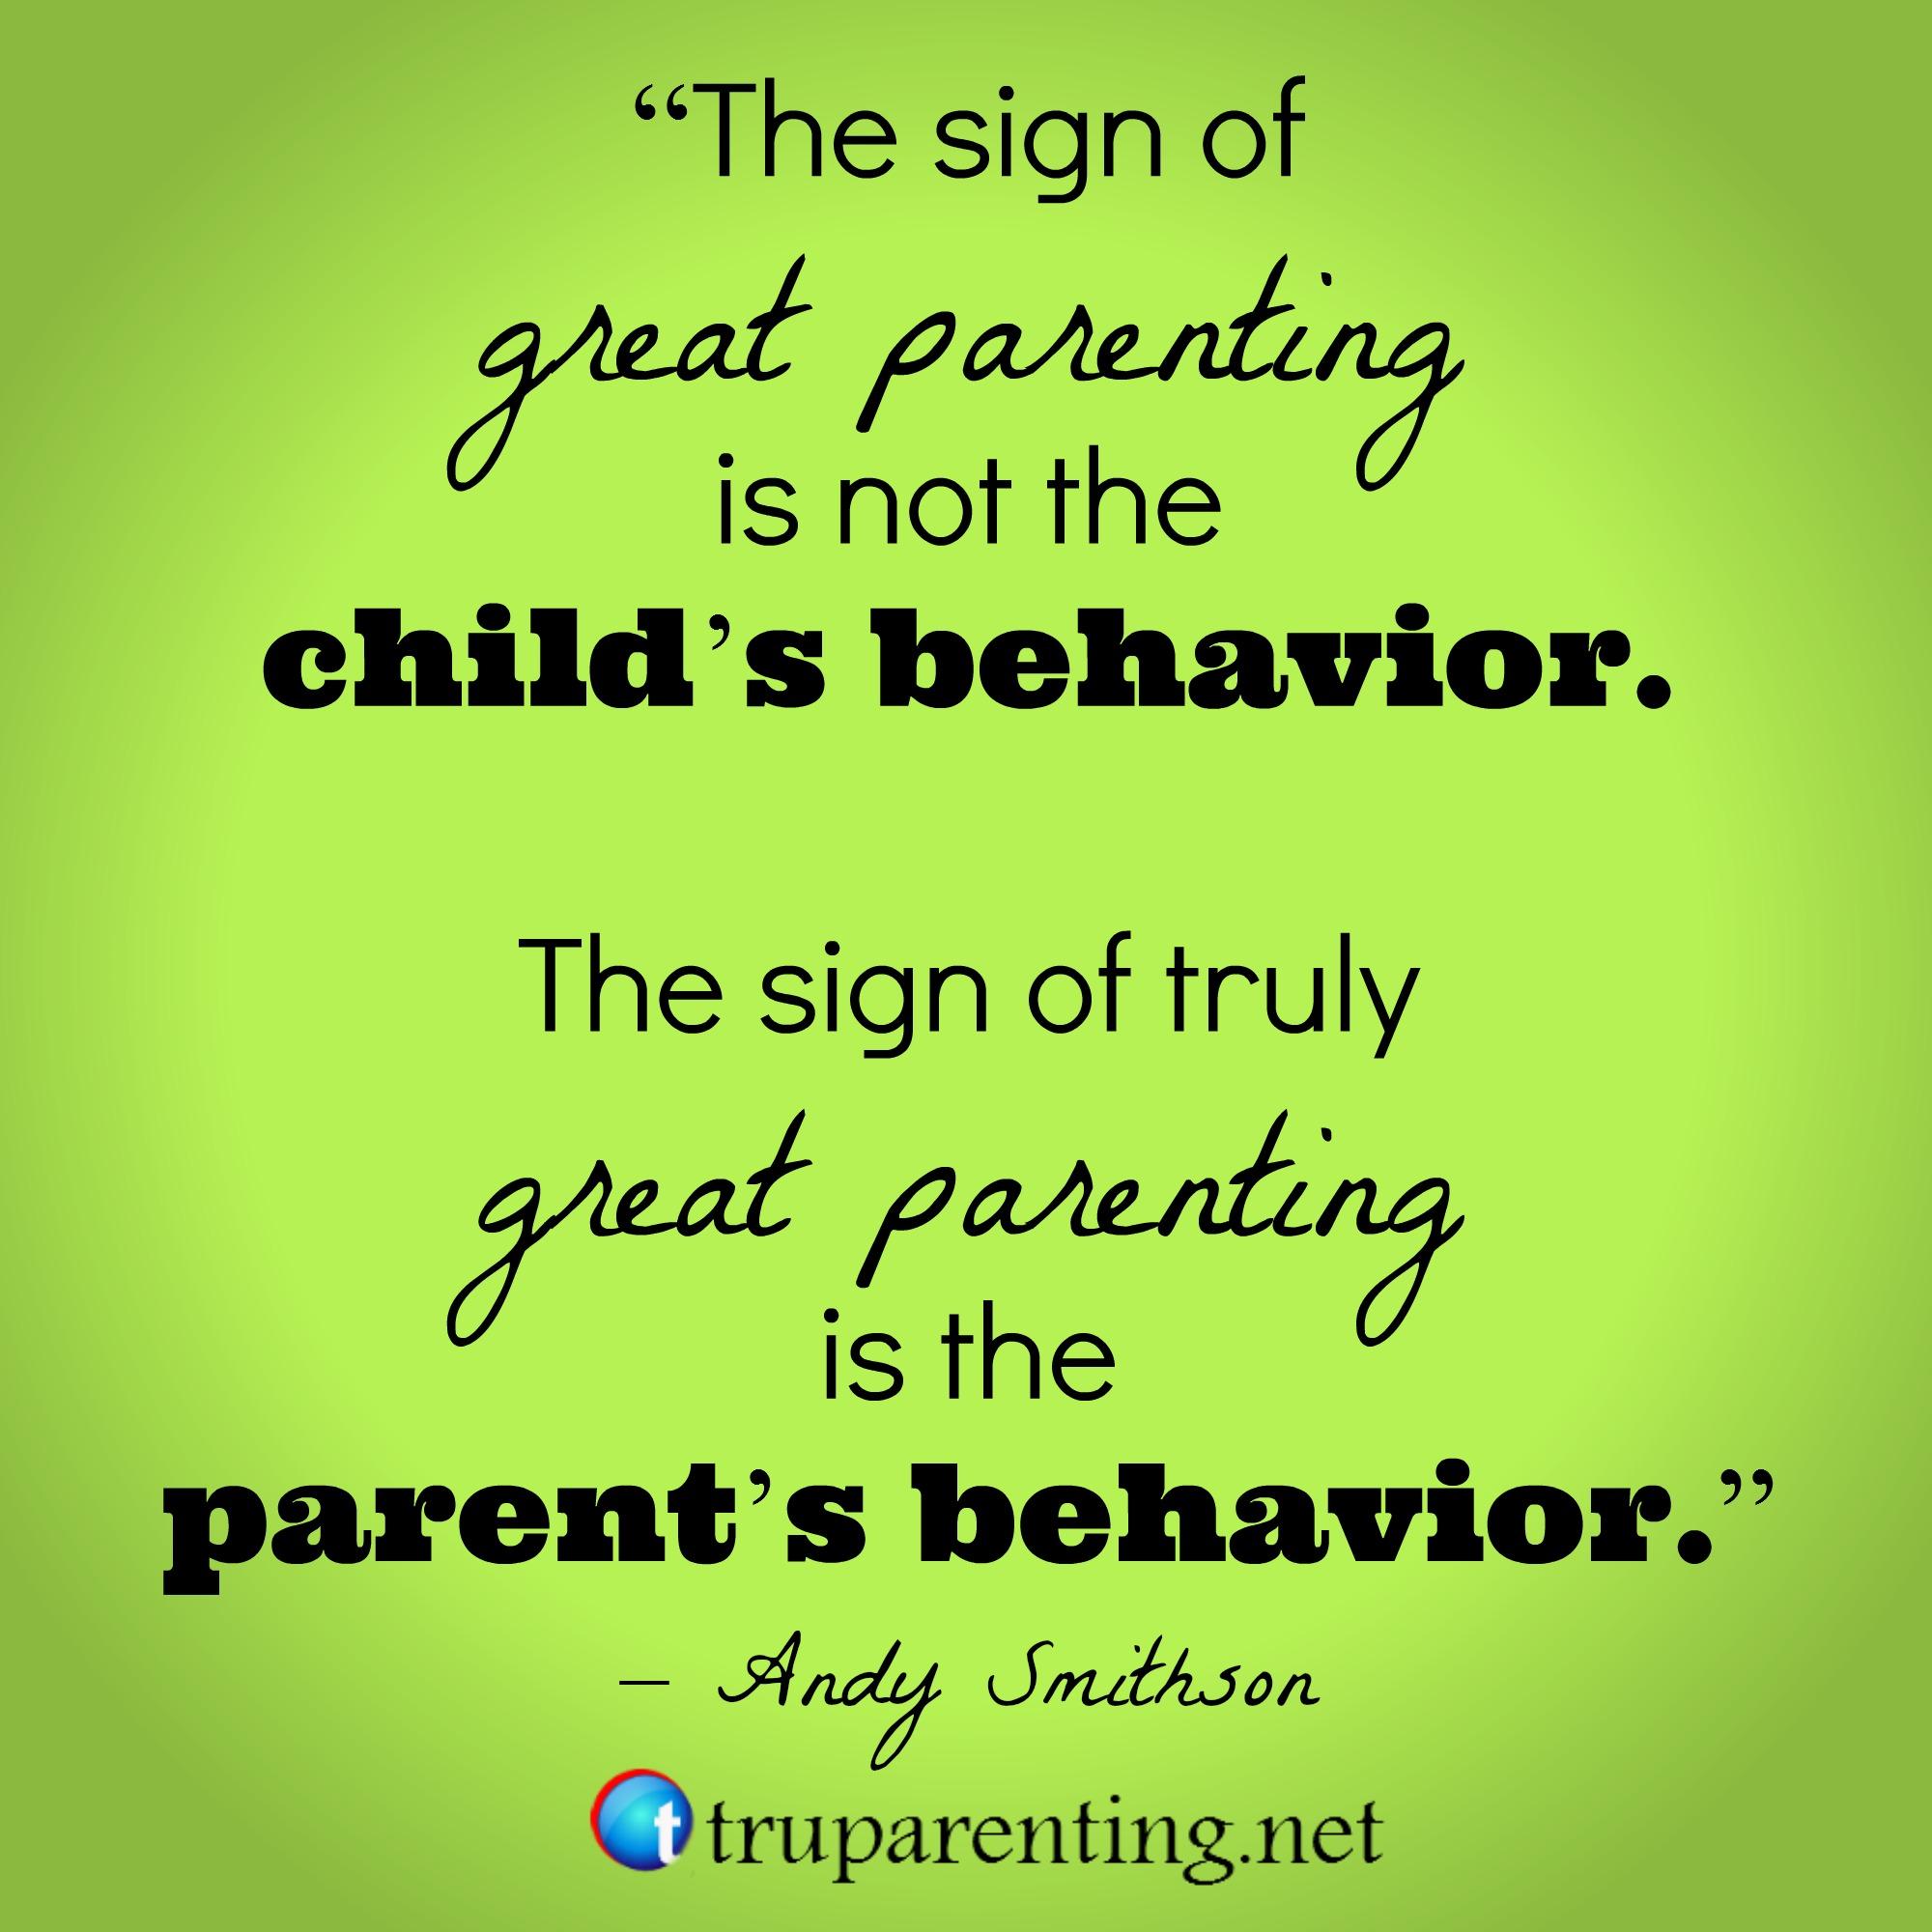 Preschool Quotes: Preschool Quotes For Parents. QuotesGram